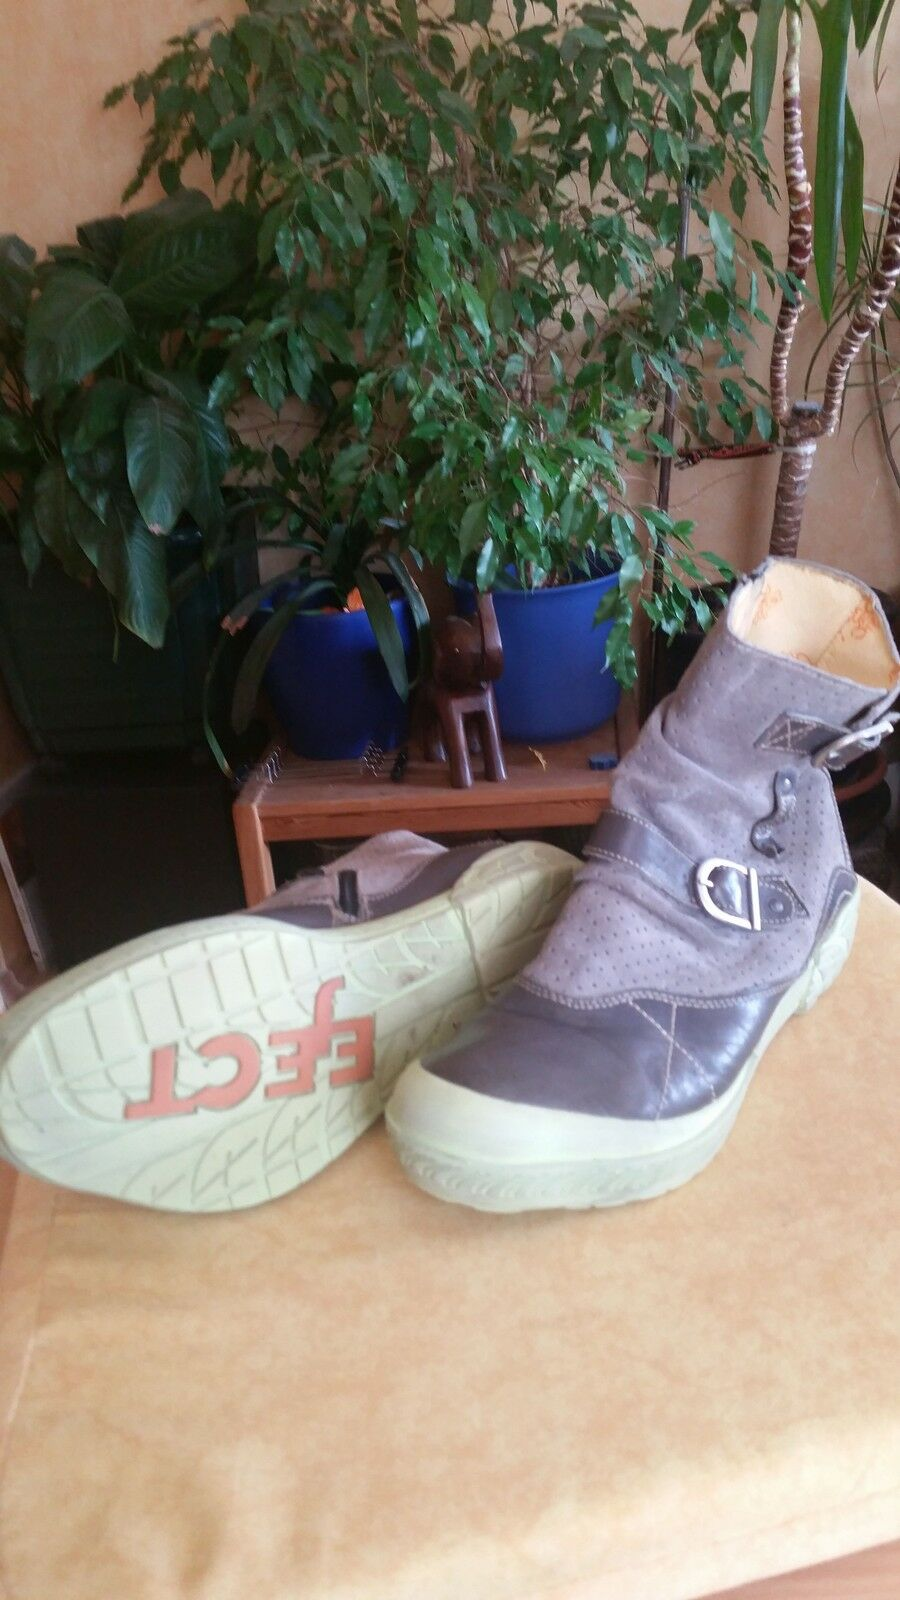 ❤ Boots Eject Wave Stiefeletten Echtleder Boots ❤ Grau  ❤ e9fc39